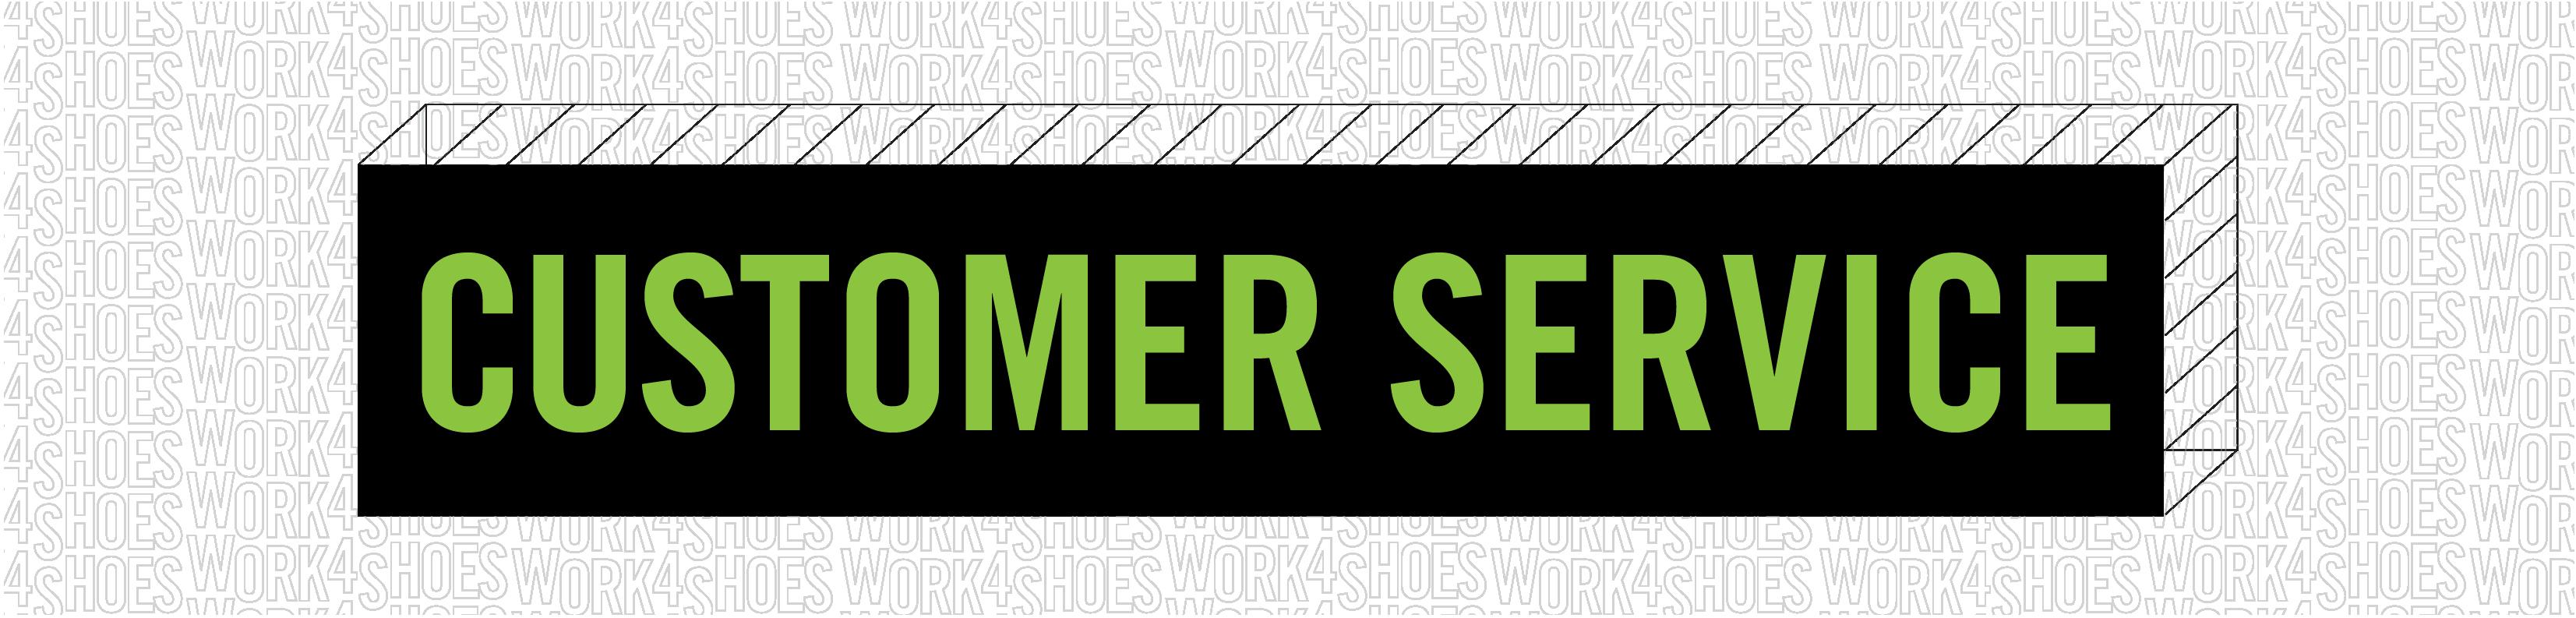 Journeys Customer Service Careers